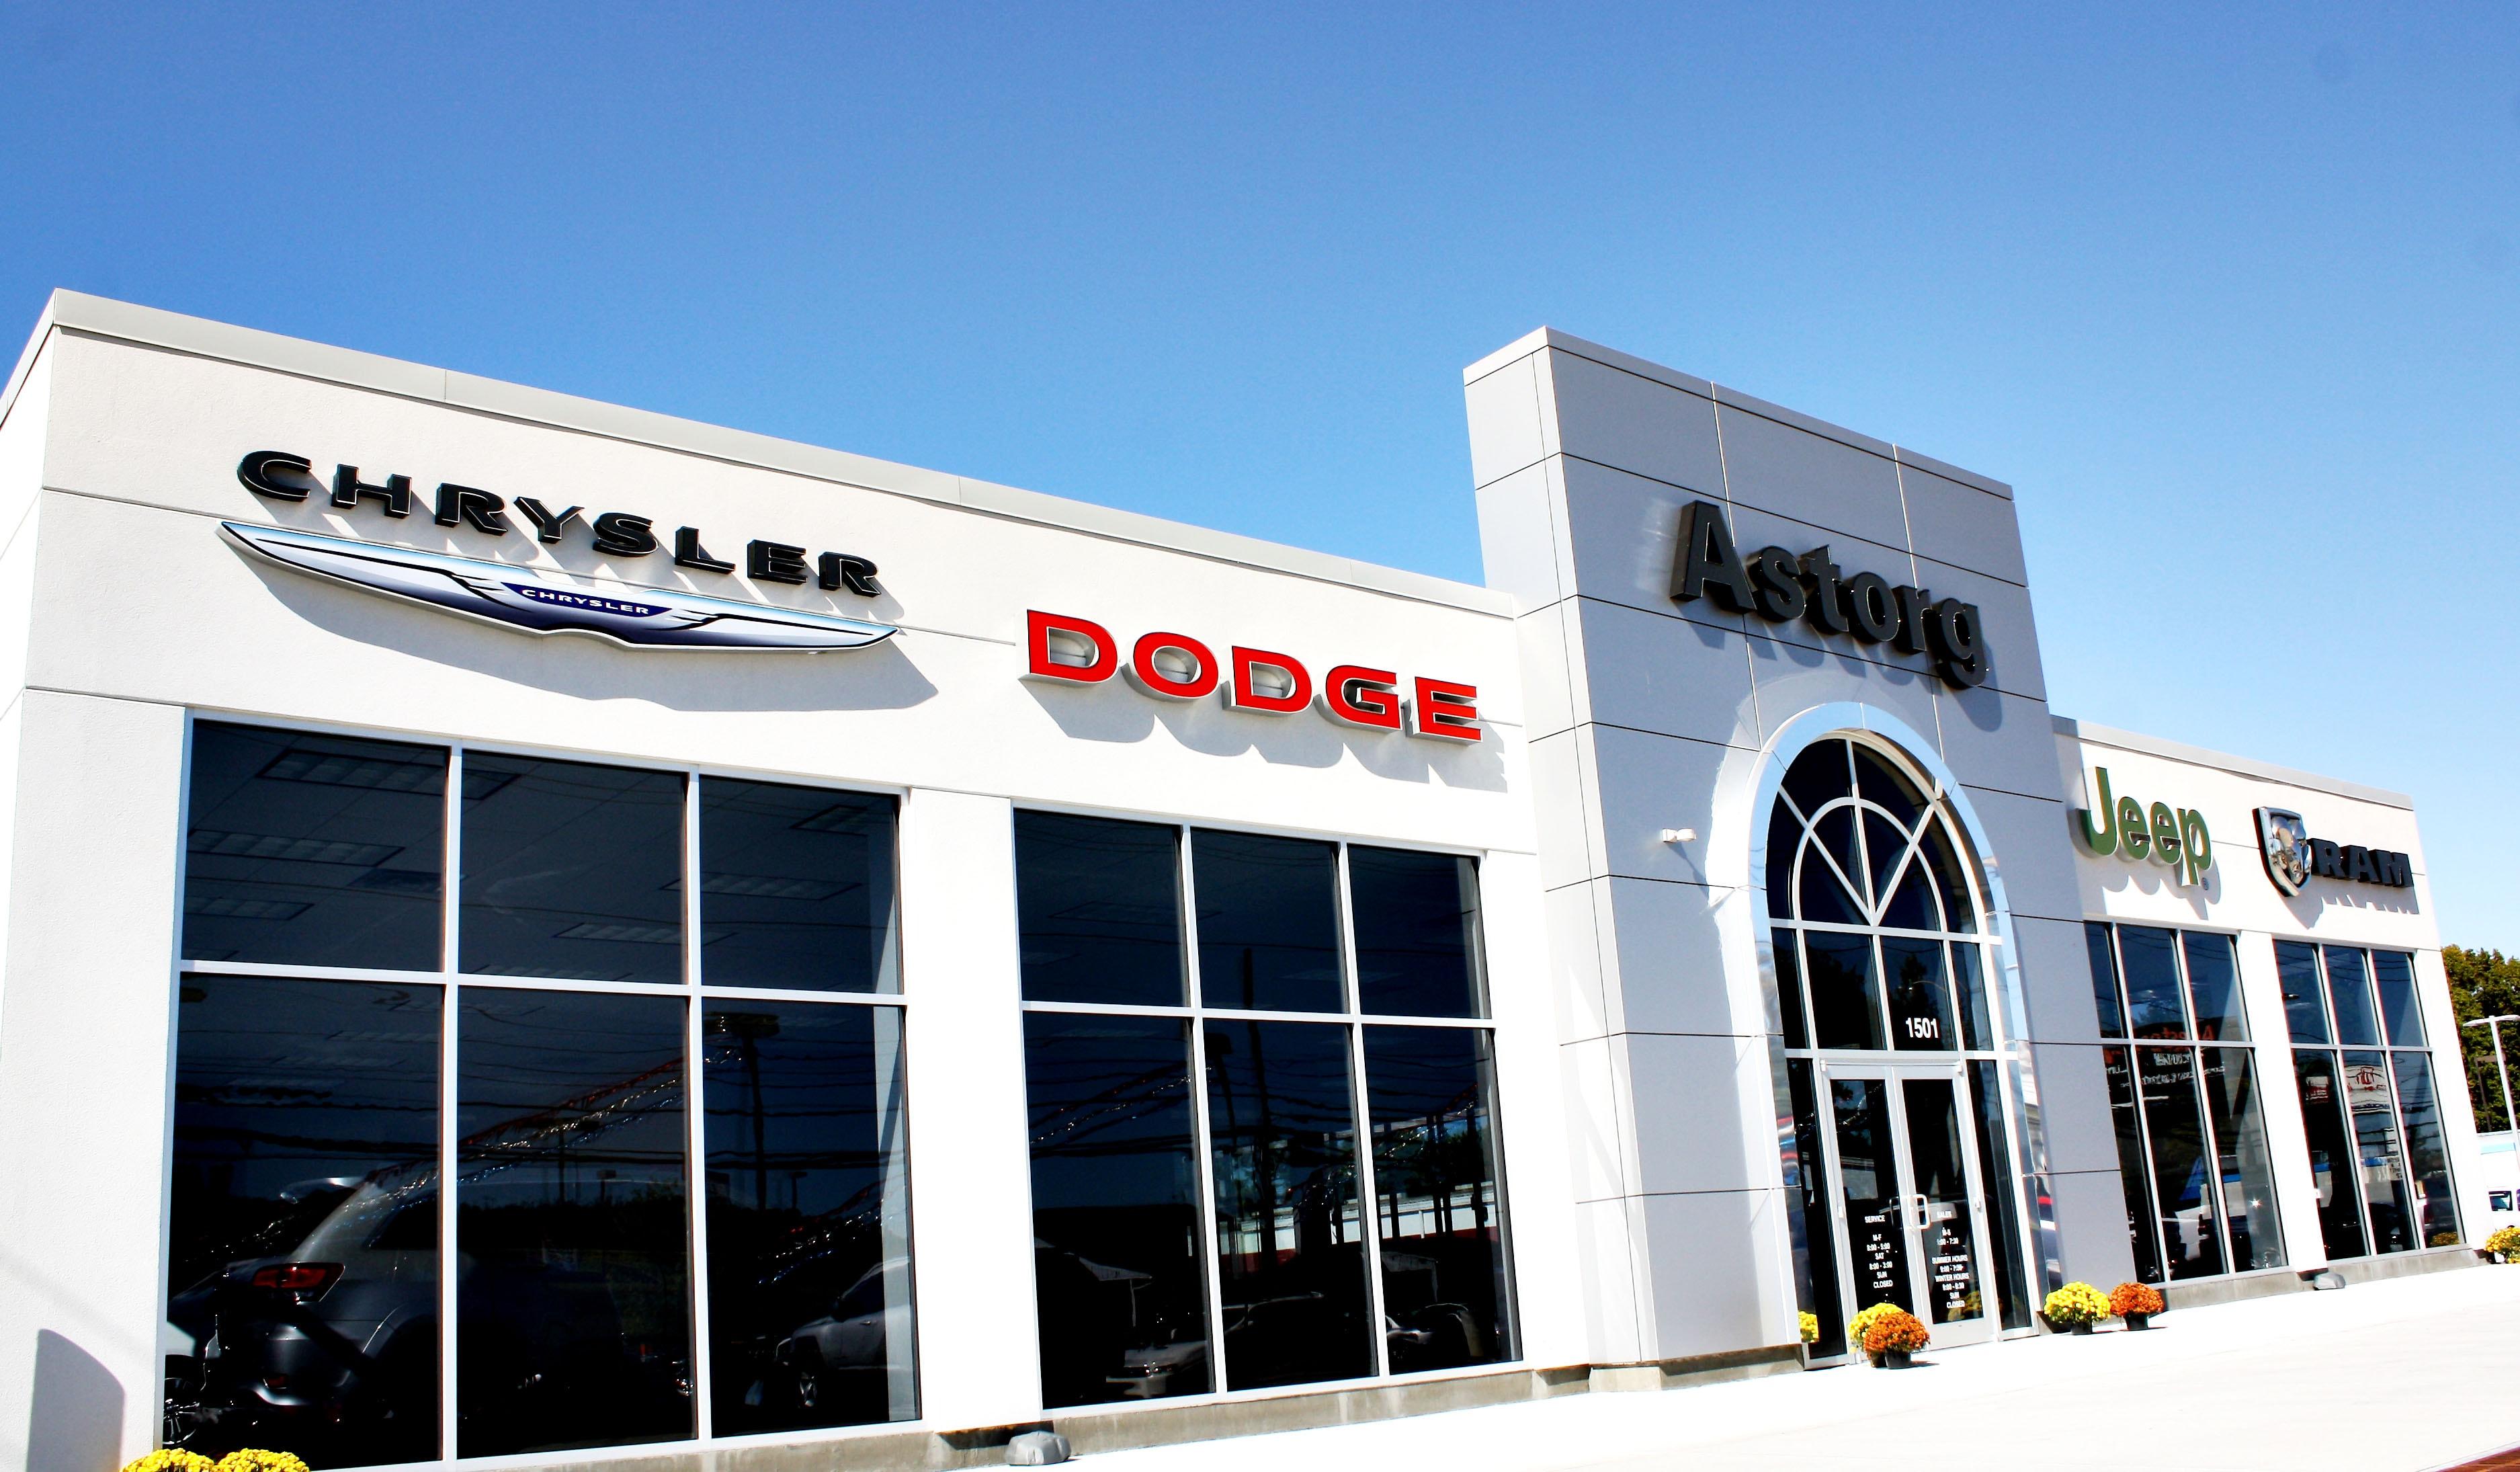 west motor company new used chrysler dodge jeep and html autos weblog. Black Bedroom Furniture Sets. Home Design Ideas